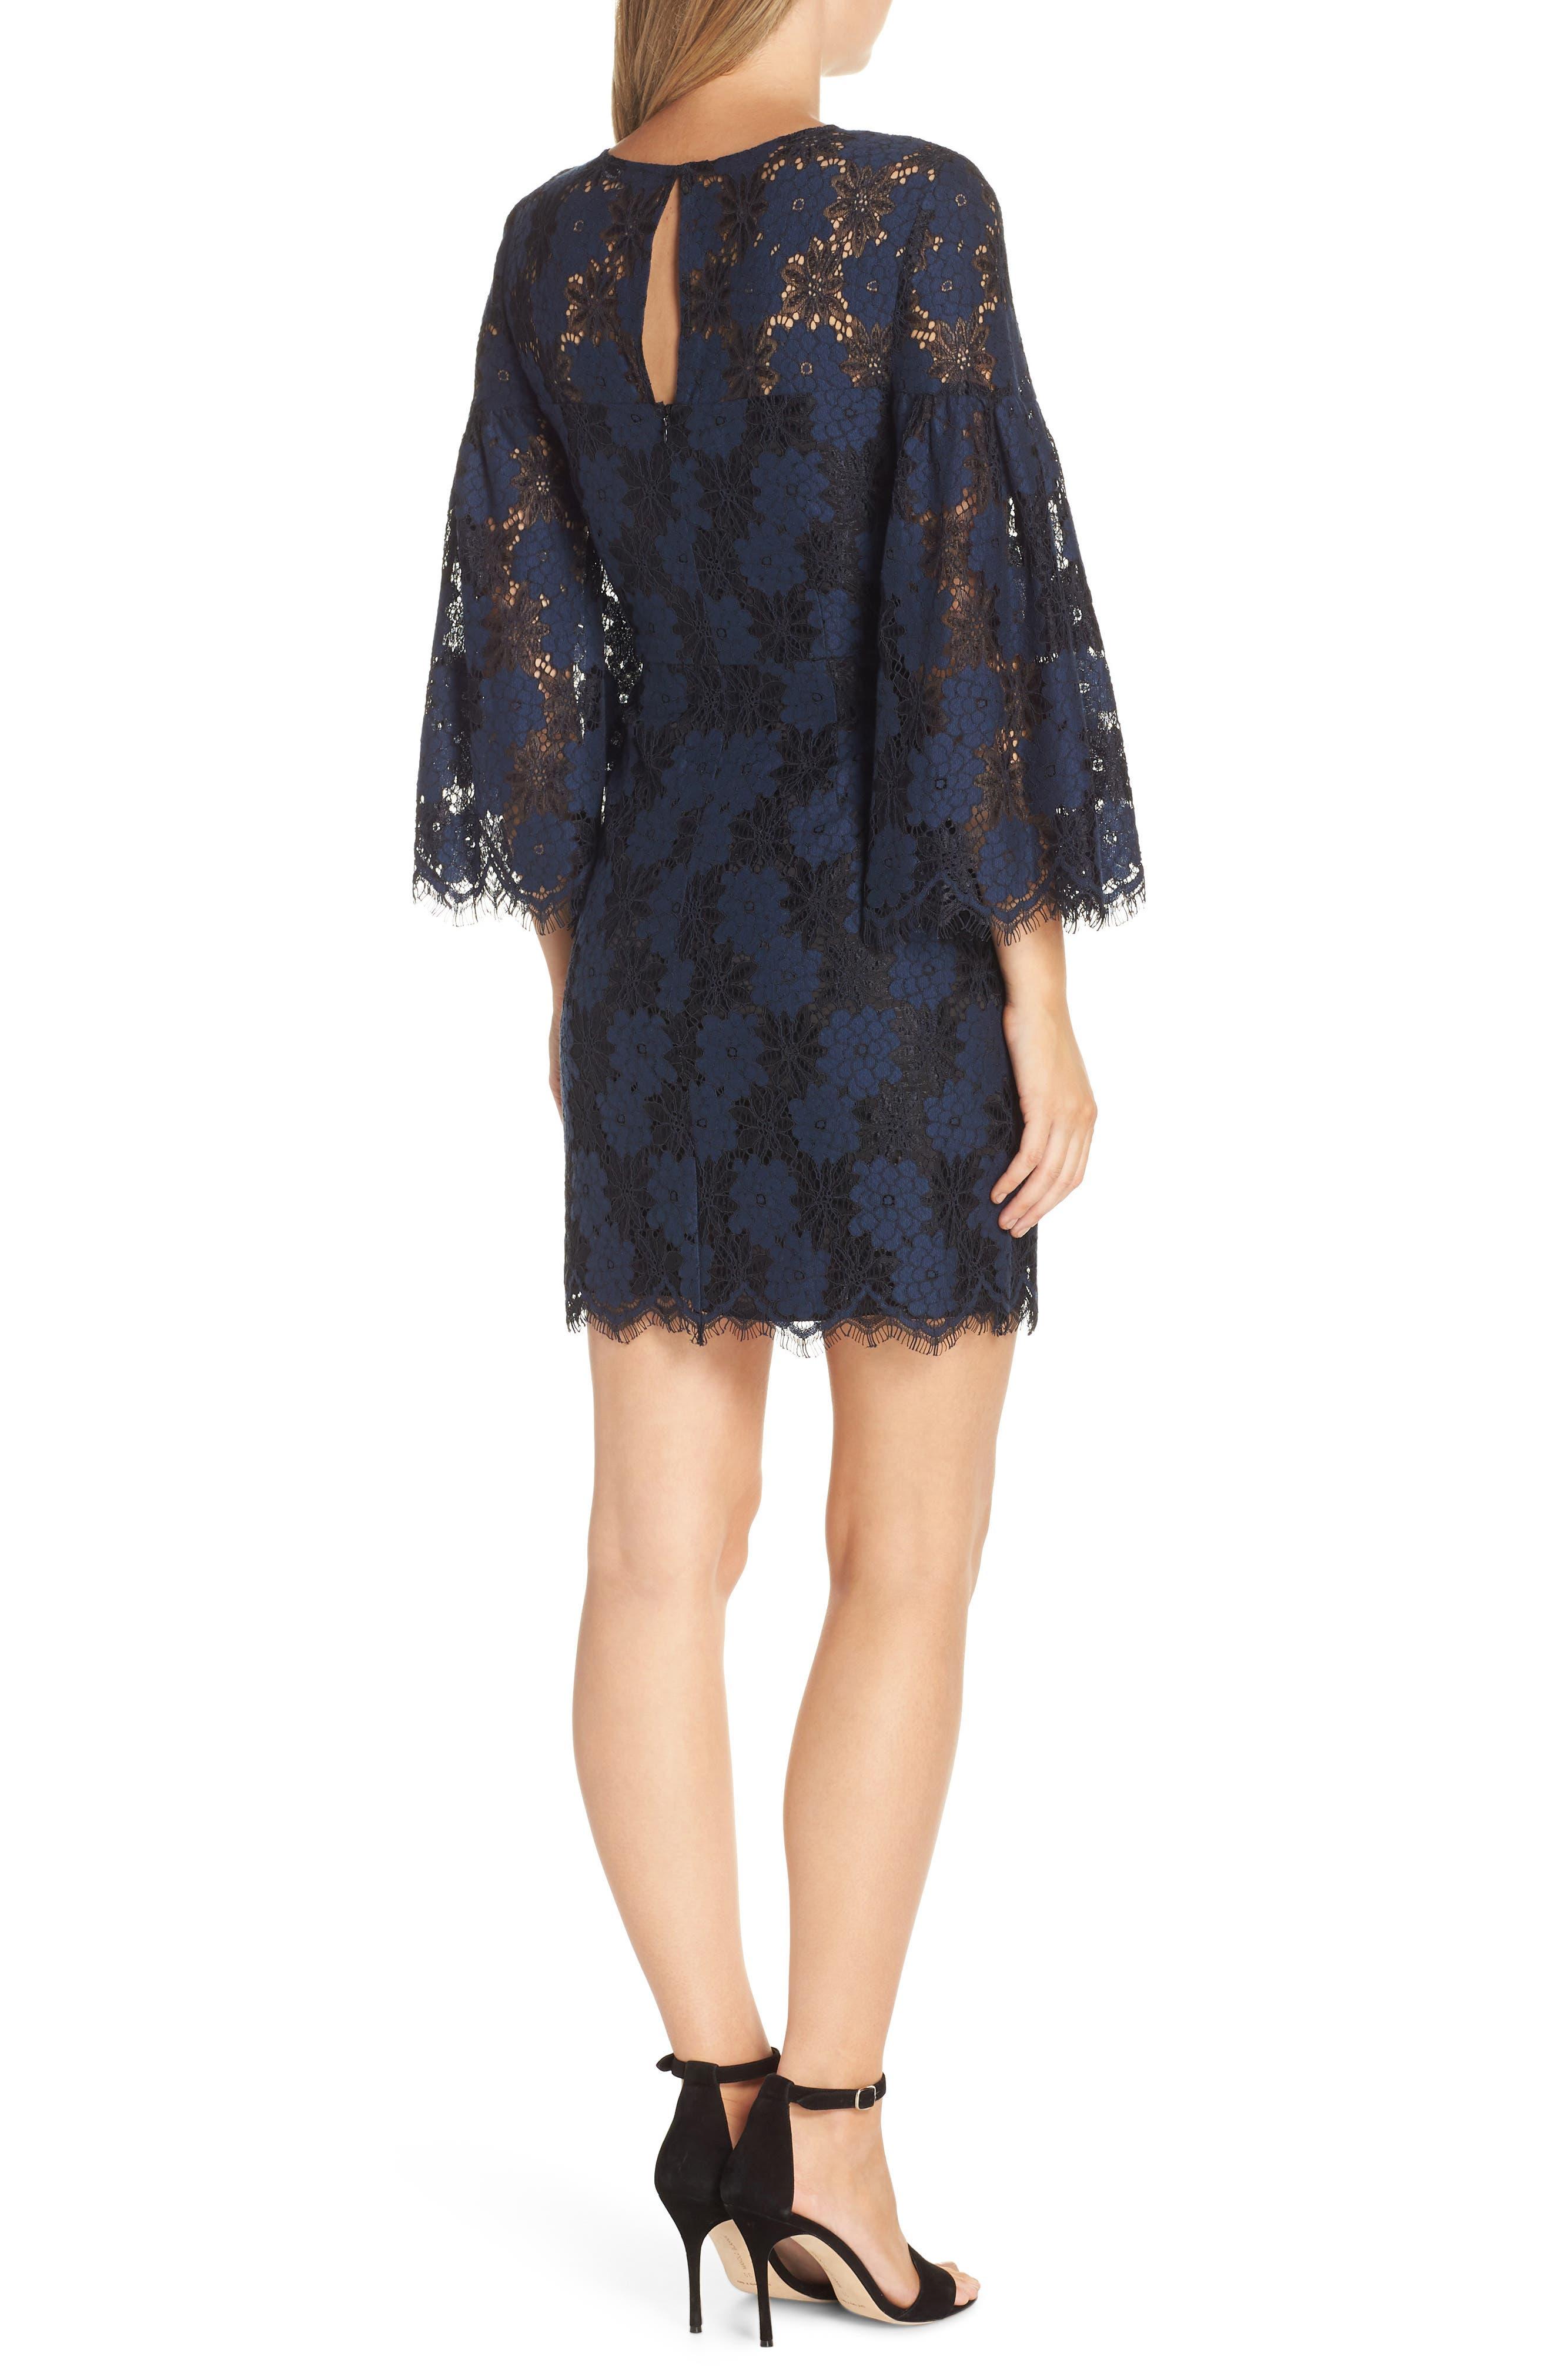 Two-Tone Lace Shift Dress,                             Alternate thumbnail 2, color,                             BLACK/ BLUE FLOWER